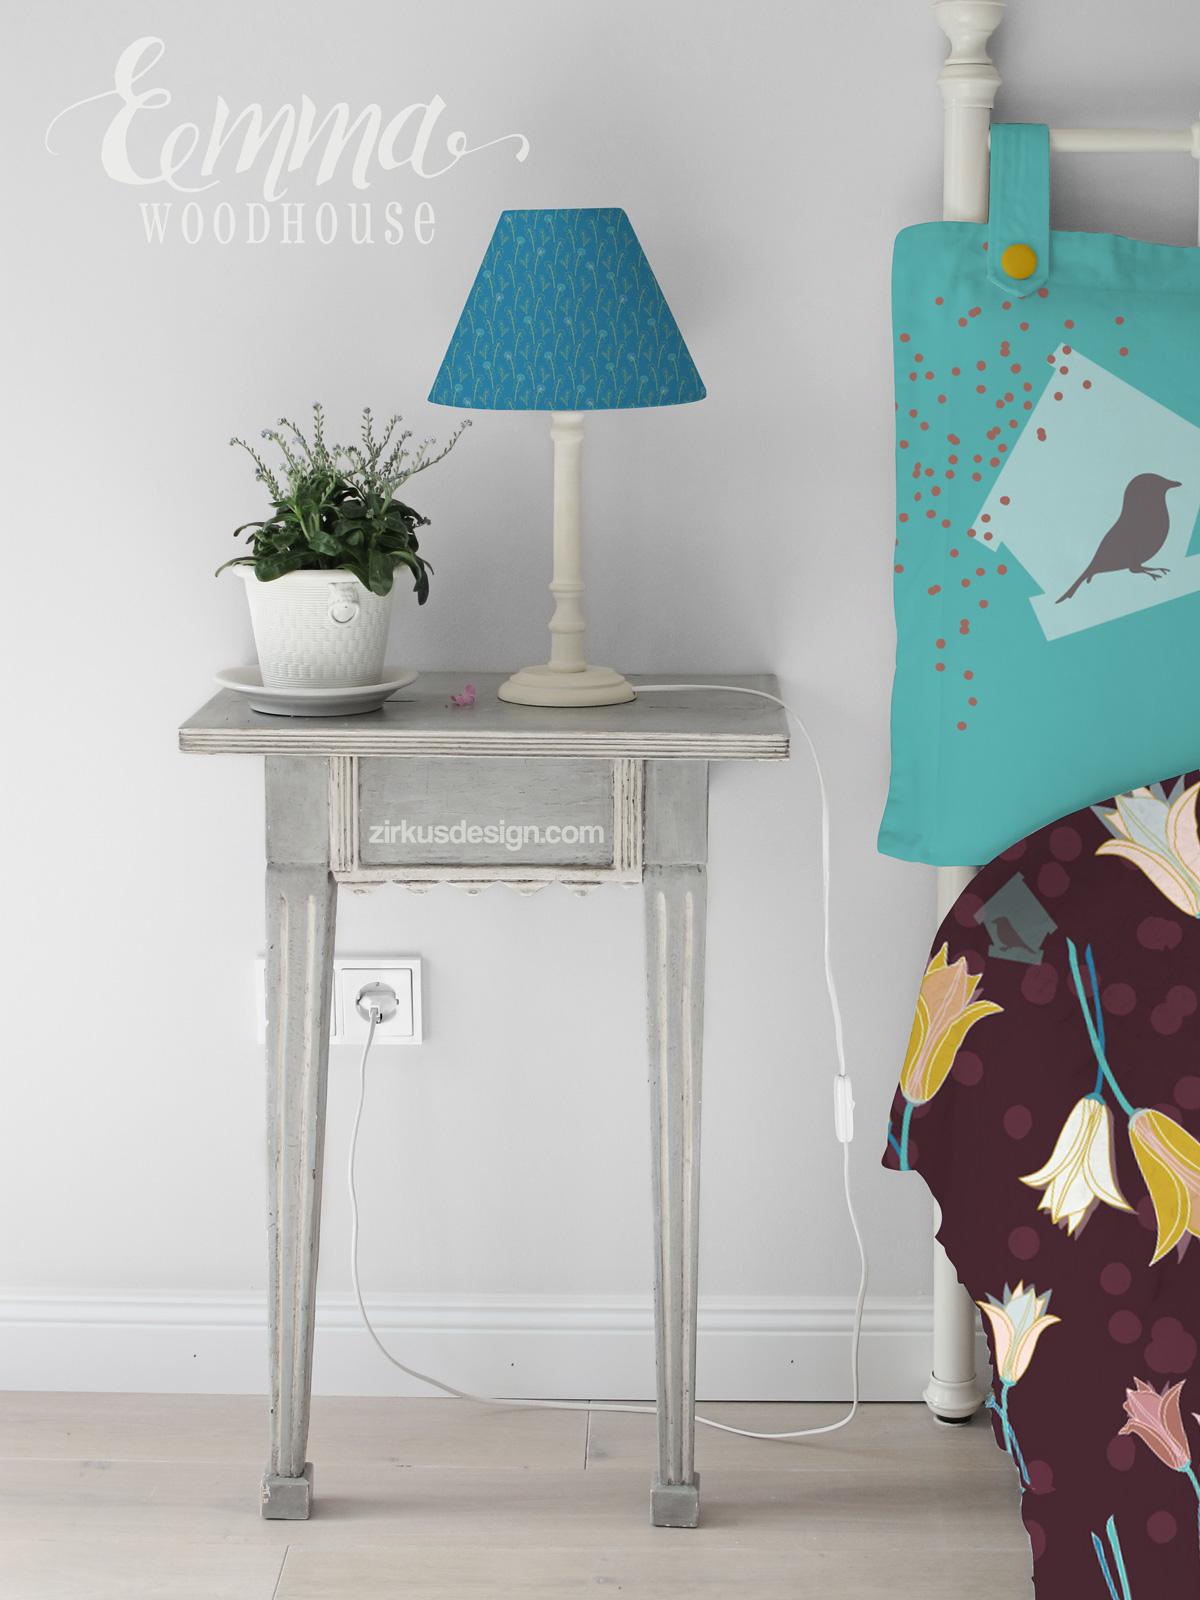 Zirkus Design | Emma Woodhouse Surfac Pattern Design Collection Bedroom Home Textiles Mockup